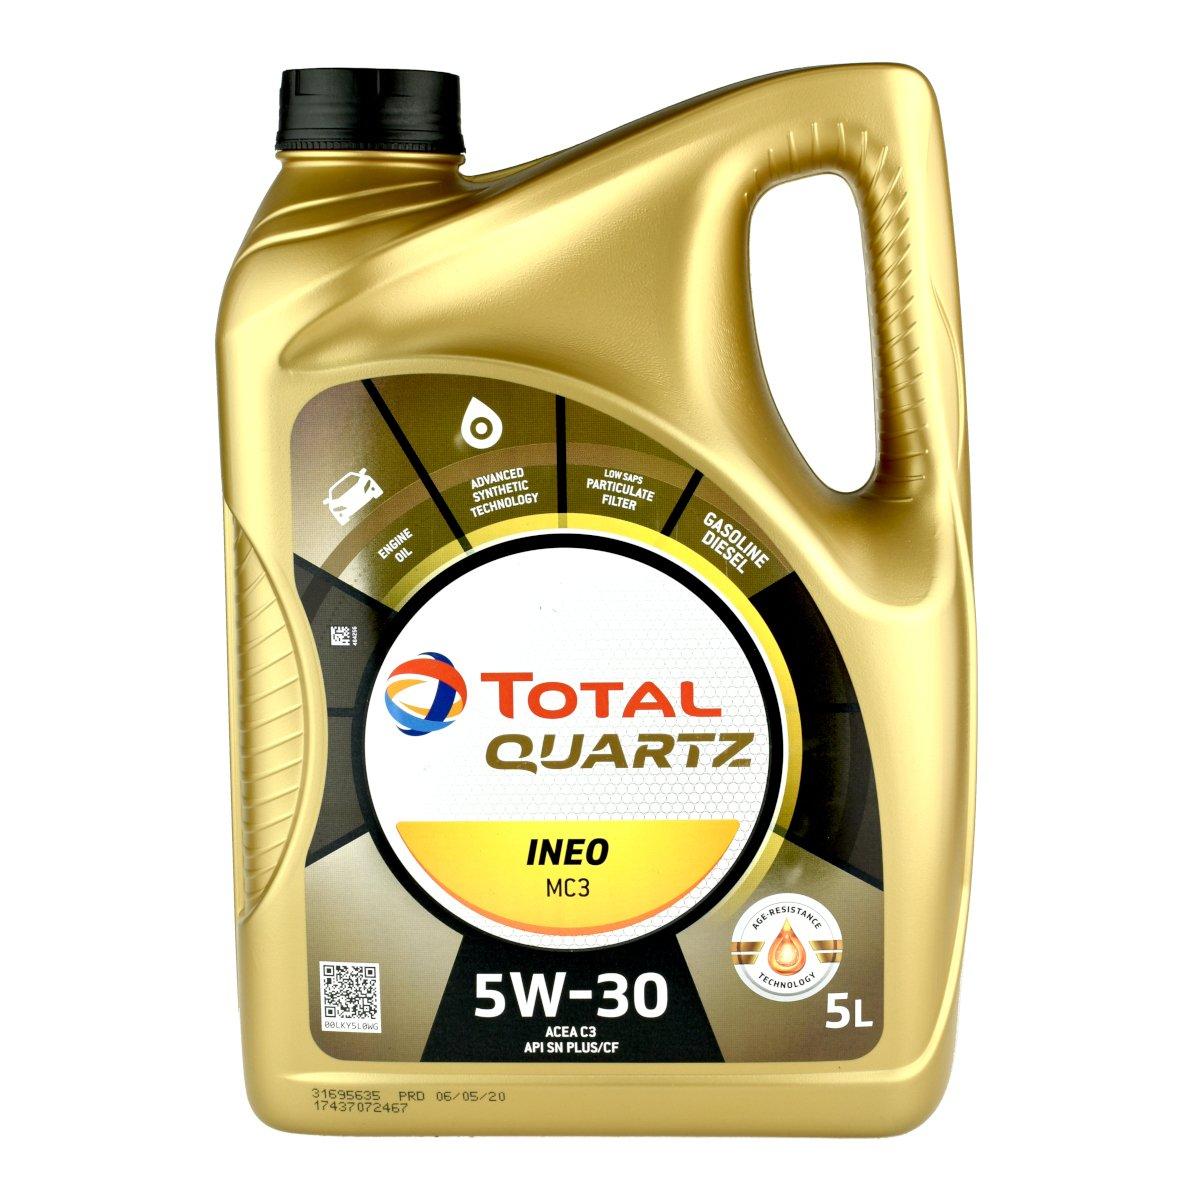 https://commercial.fordfuels.co.uk/wp-content/uploads/sites/10/Total-Quartz-Ineo-MC3-5W-30-350x350.jpg+https://commercial.fordfuels.co.uk/wp-content/uploads/sites/10/Total-Quartz-Ineo-MC3-5W-30-700x700.jpg